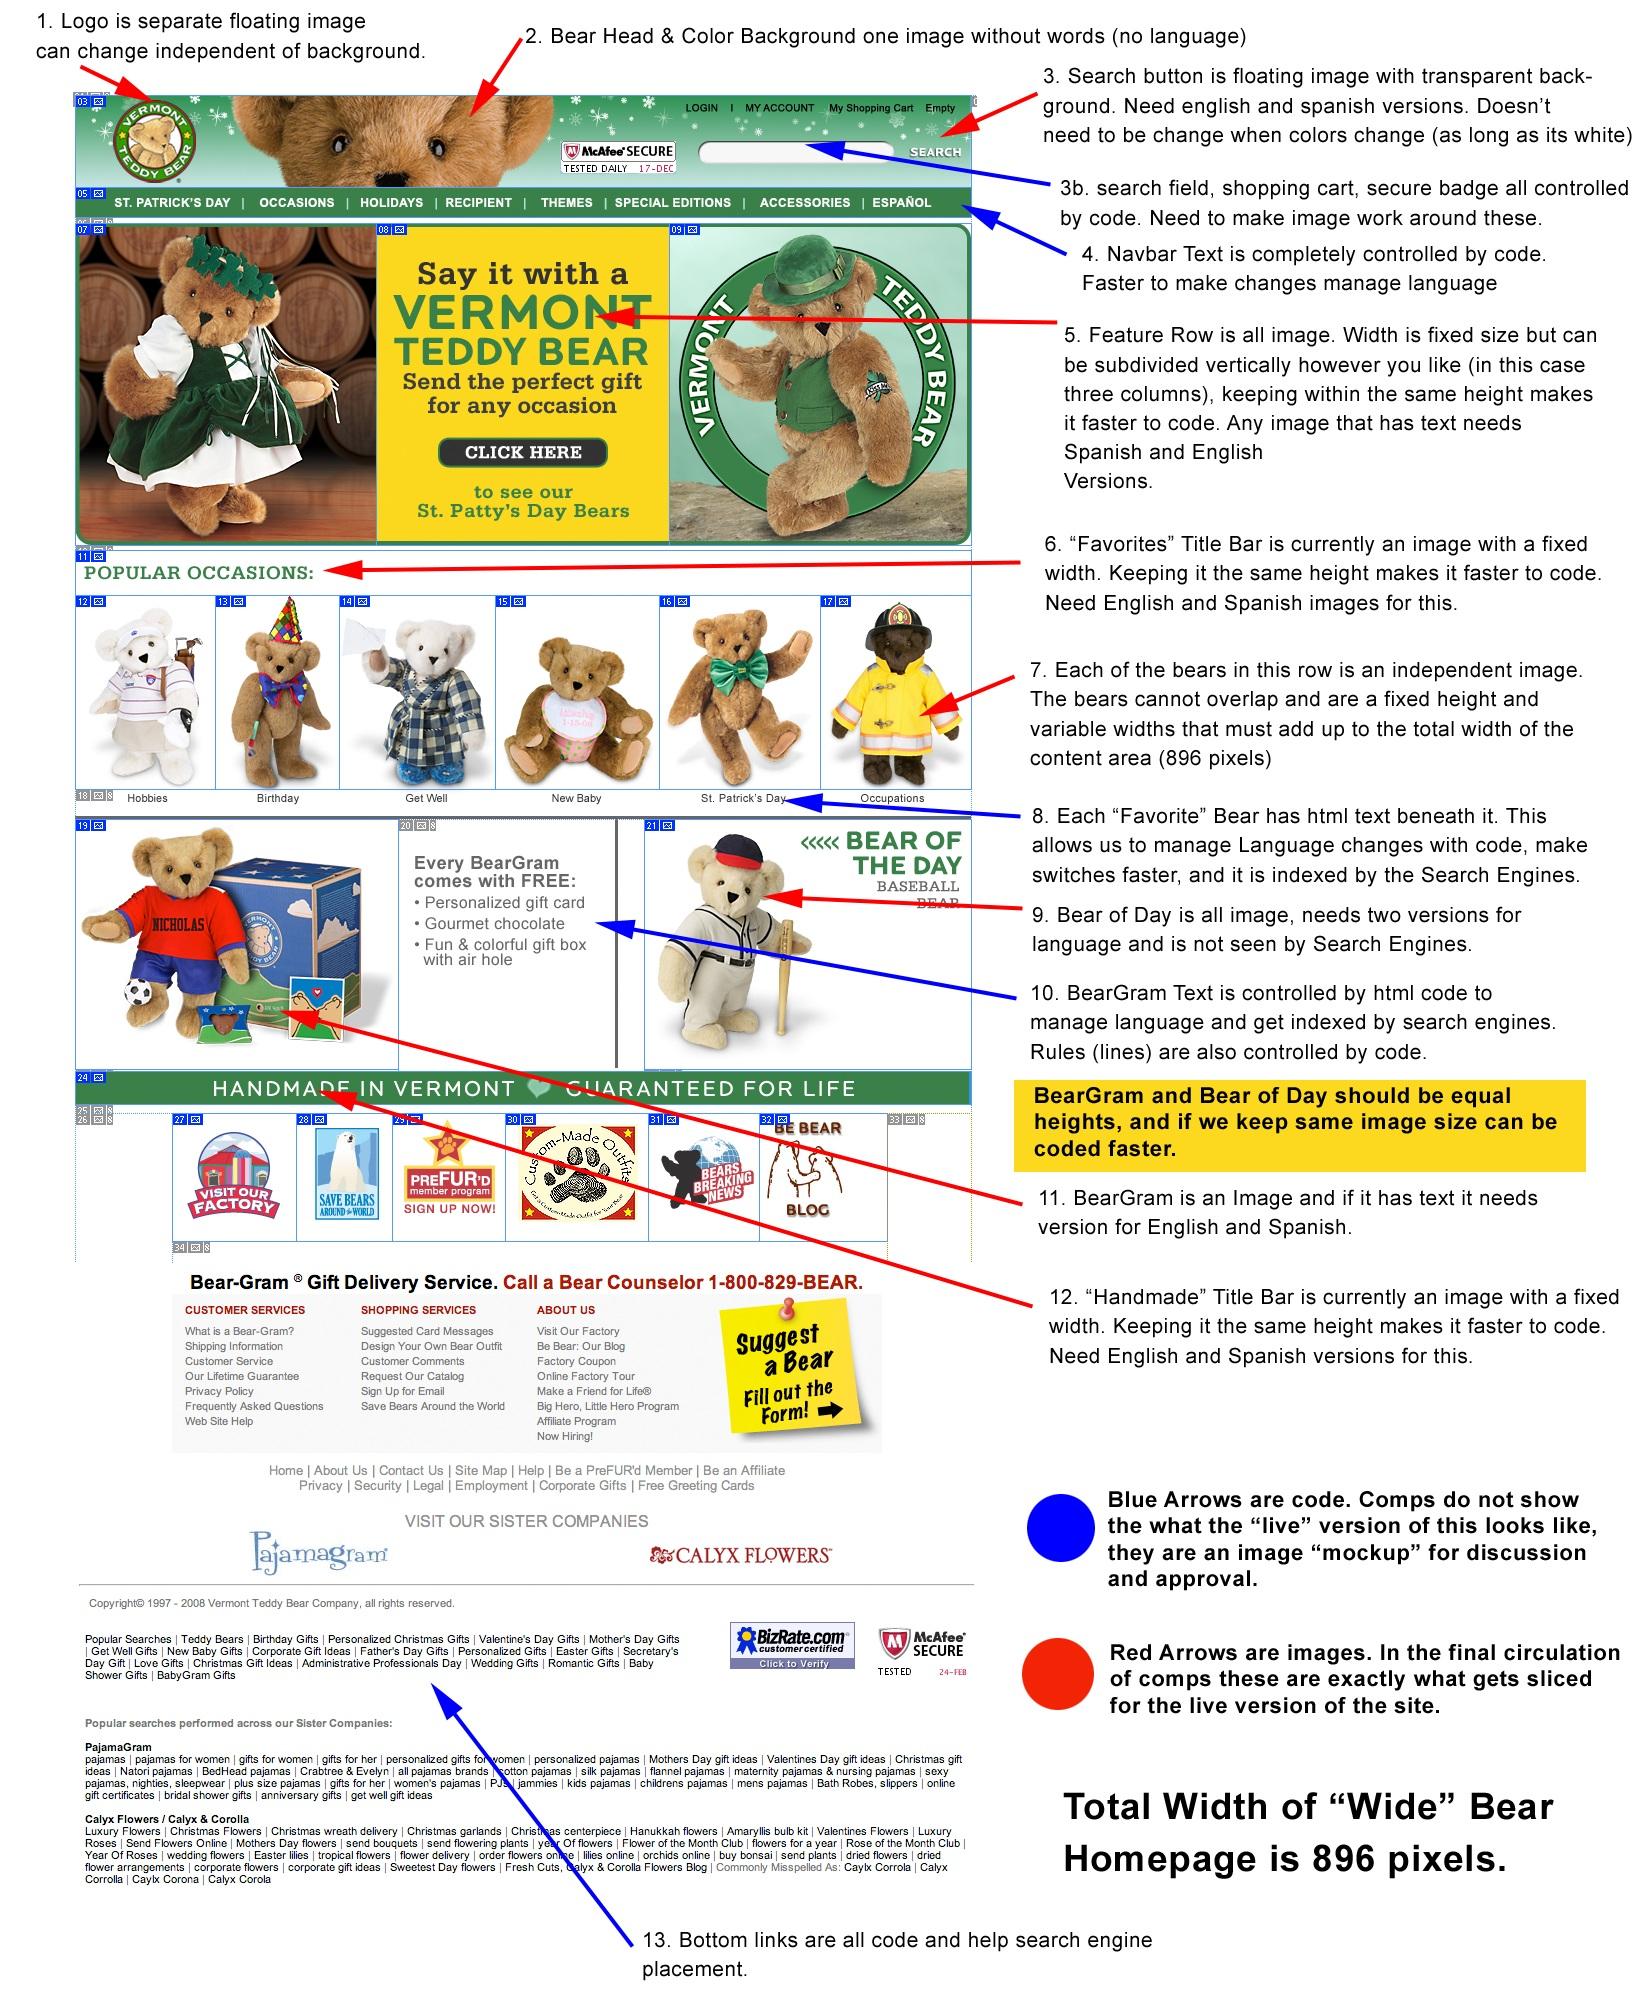 Bear+Homepage+Callouts+StPat.jpg